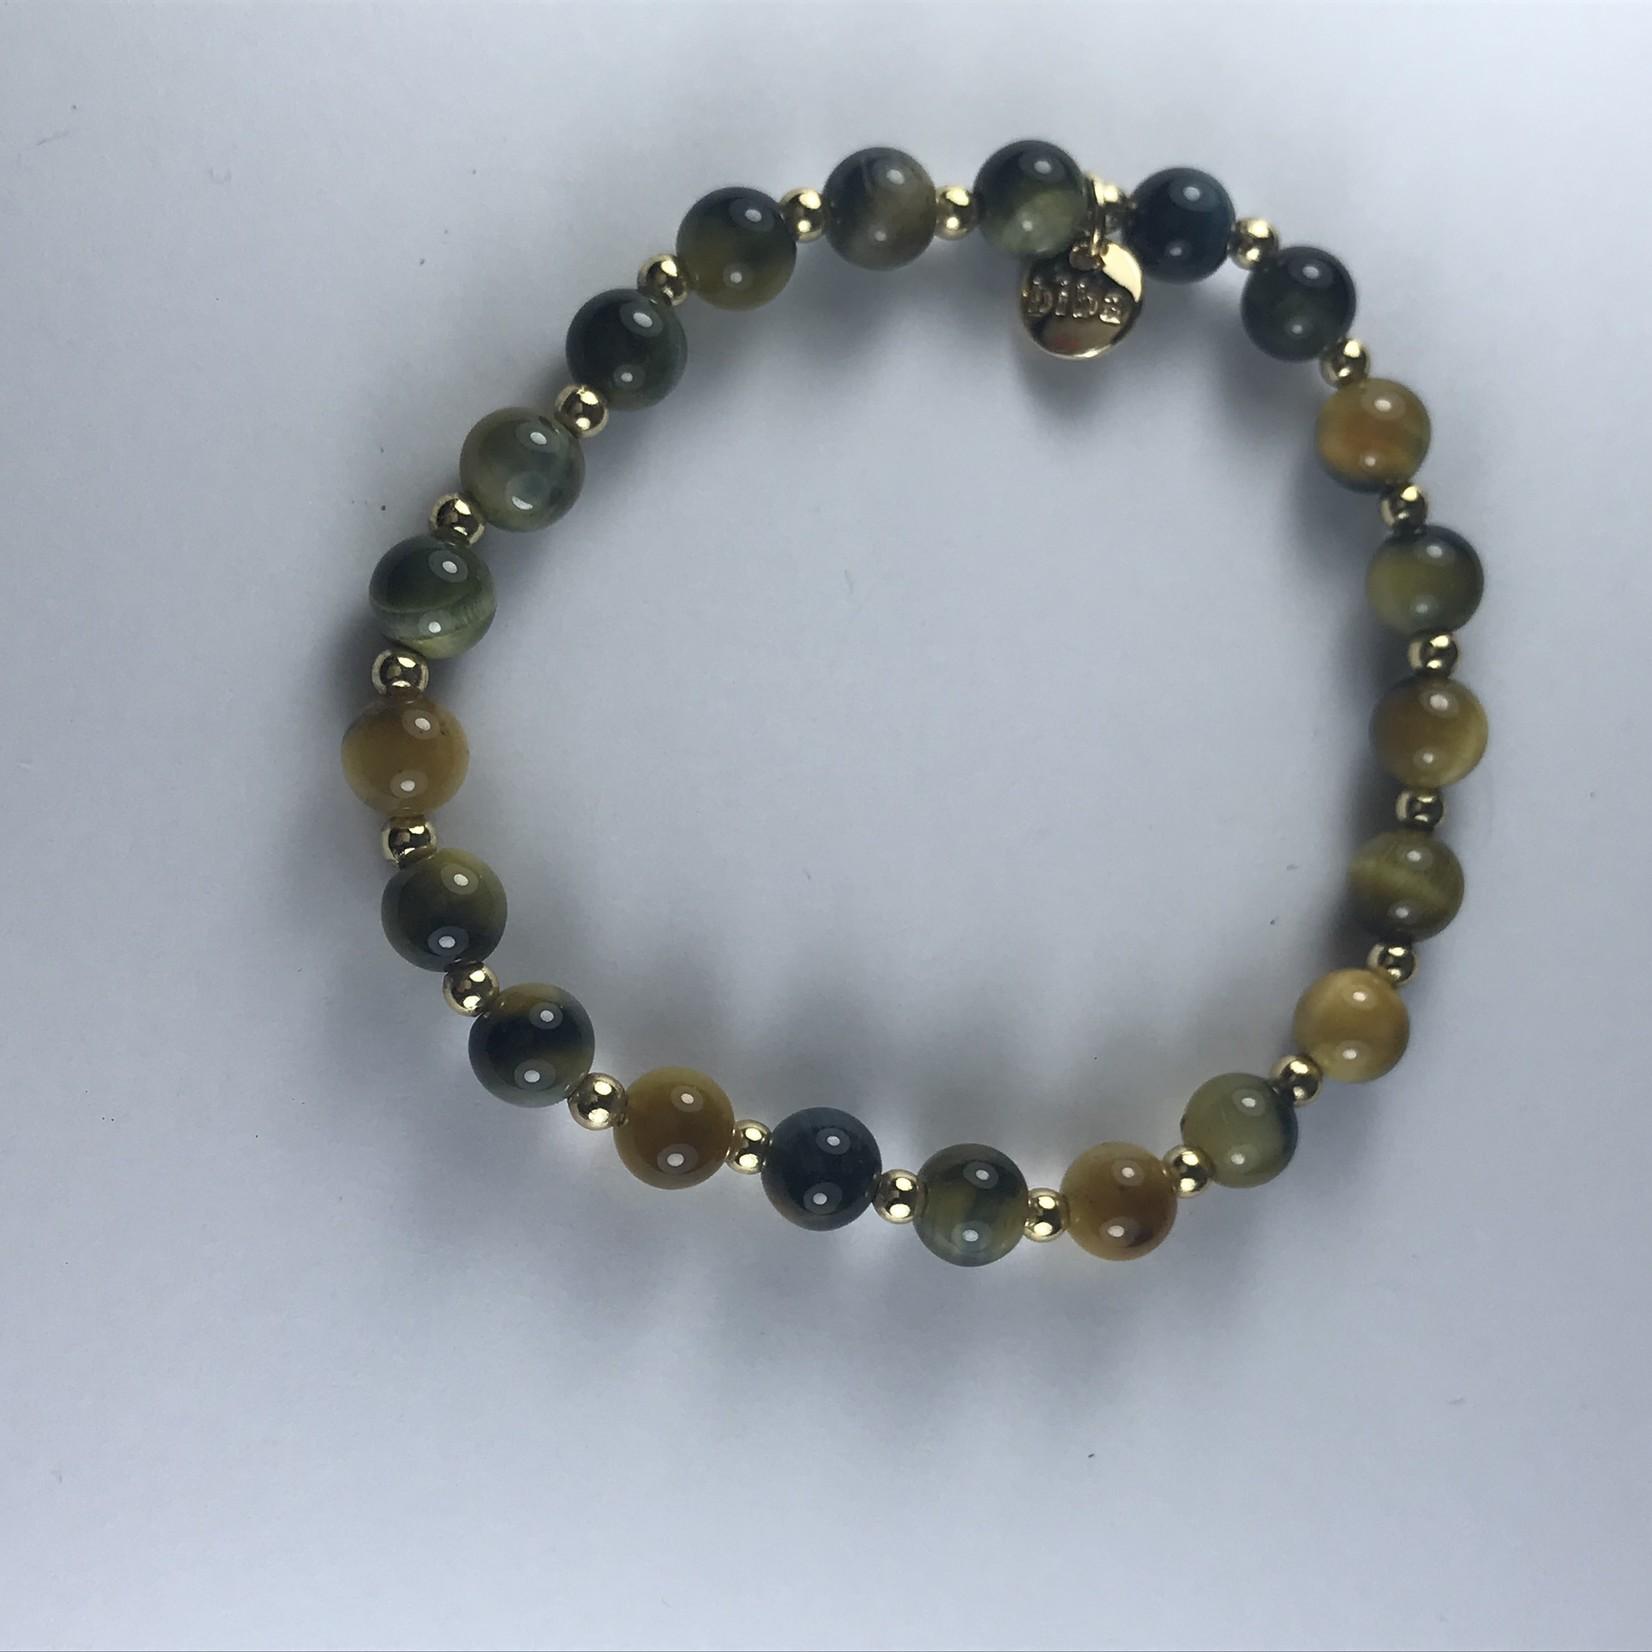 Biba armband goudkleurig met donkergroene en gele bolletjes